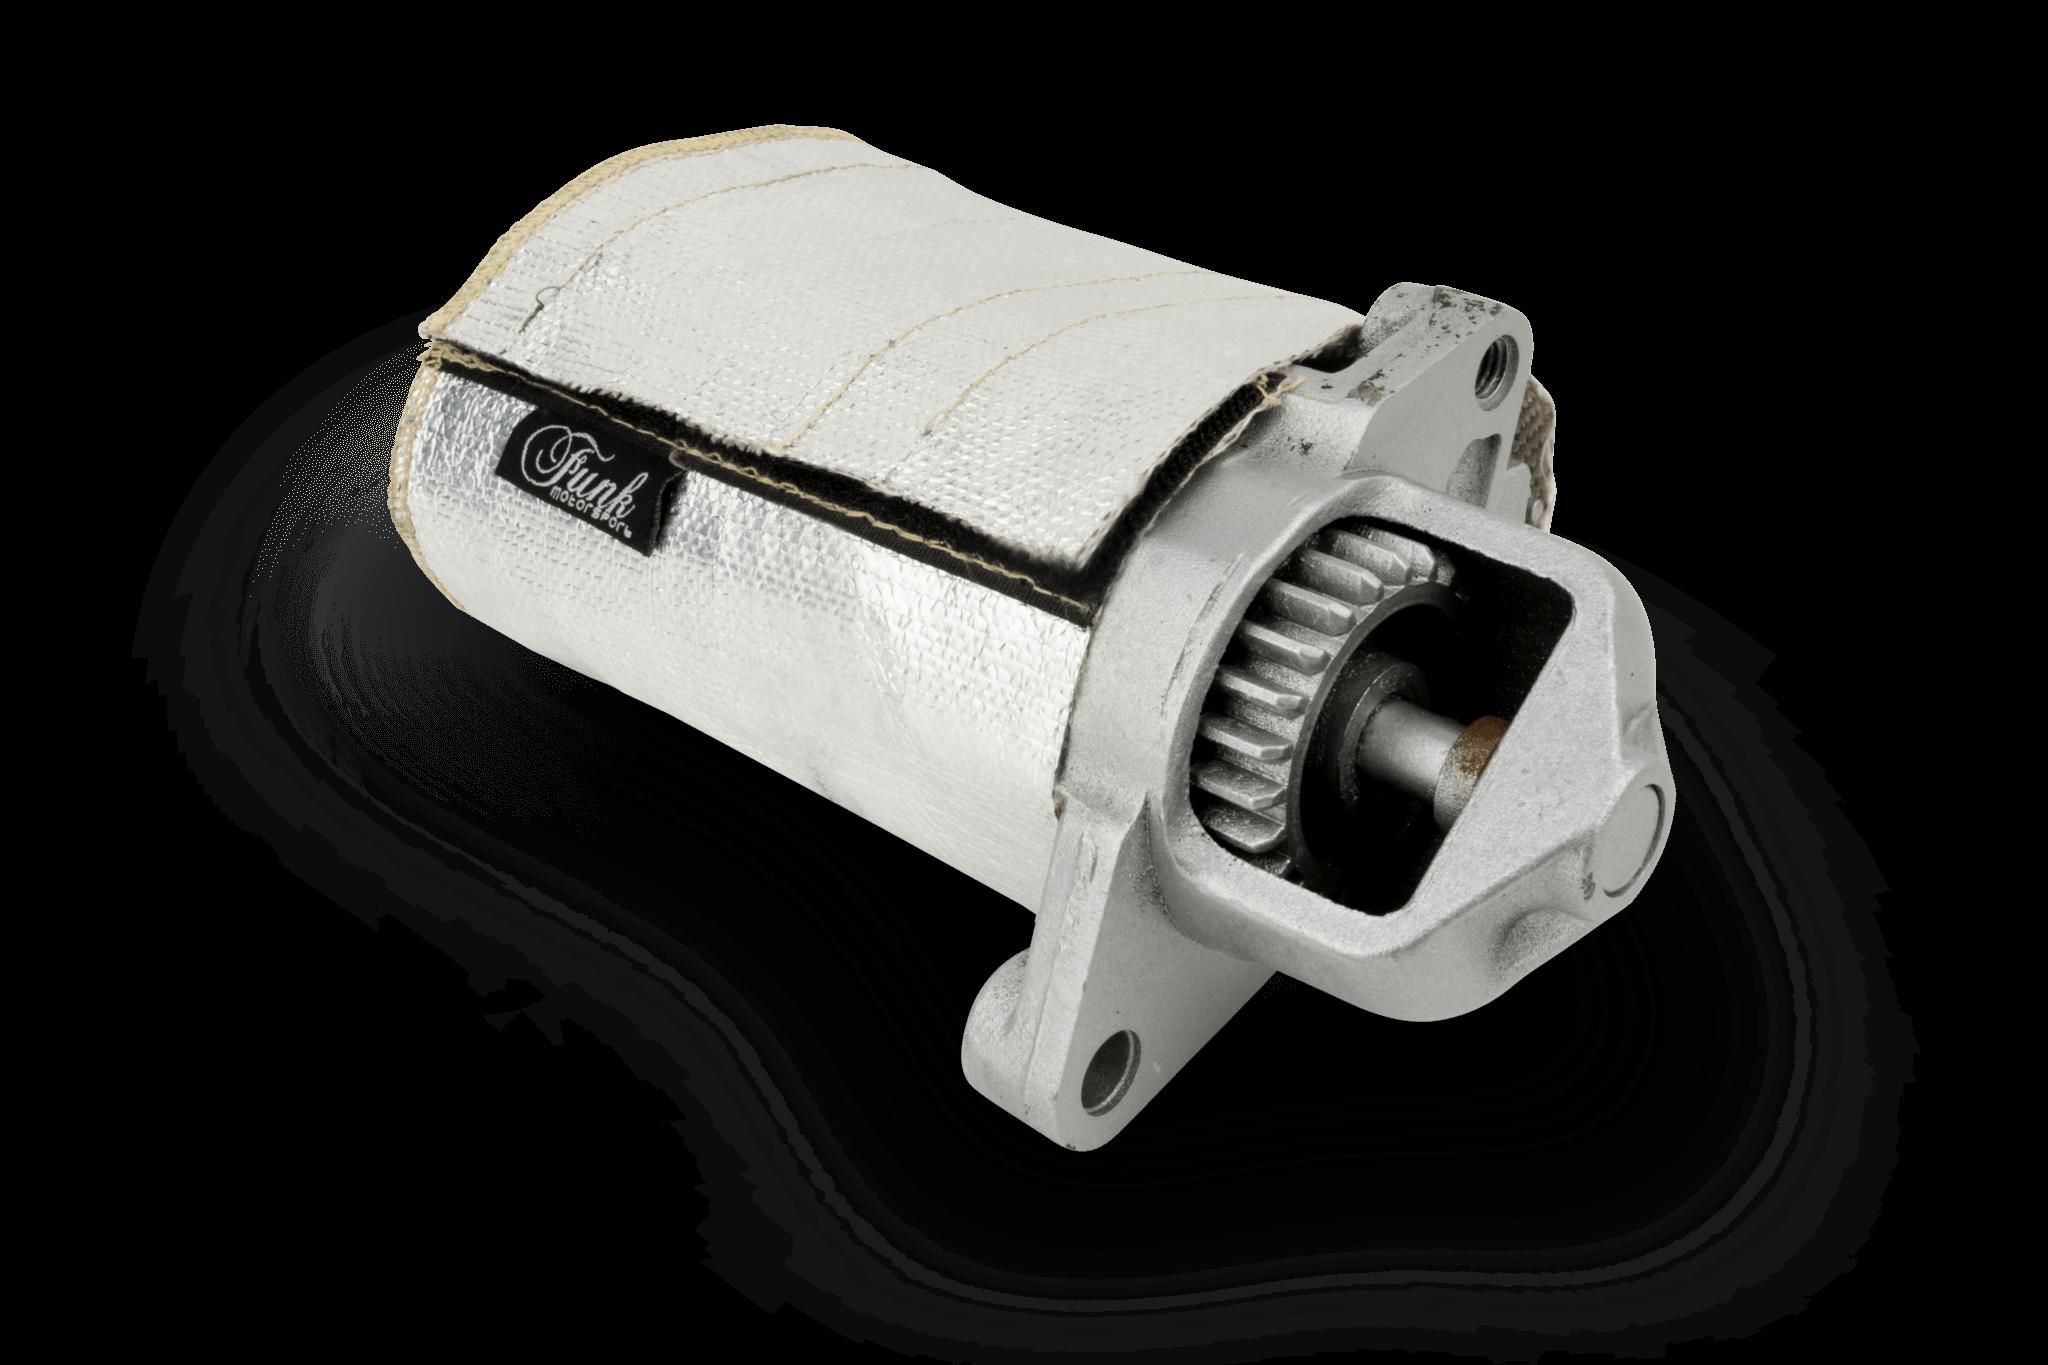 Funk Motorsport - Starter Motor Protection durability cover, FUNK-STRTCV